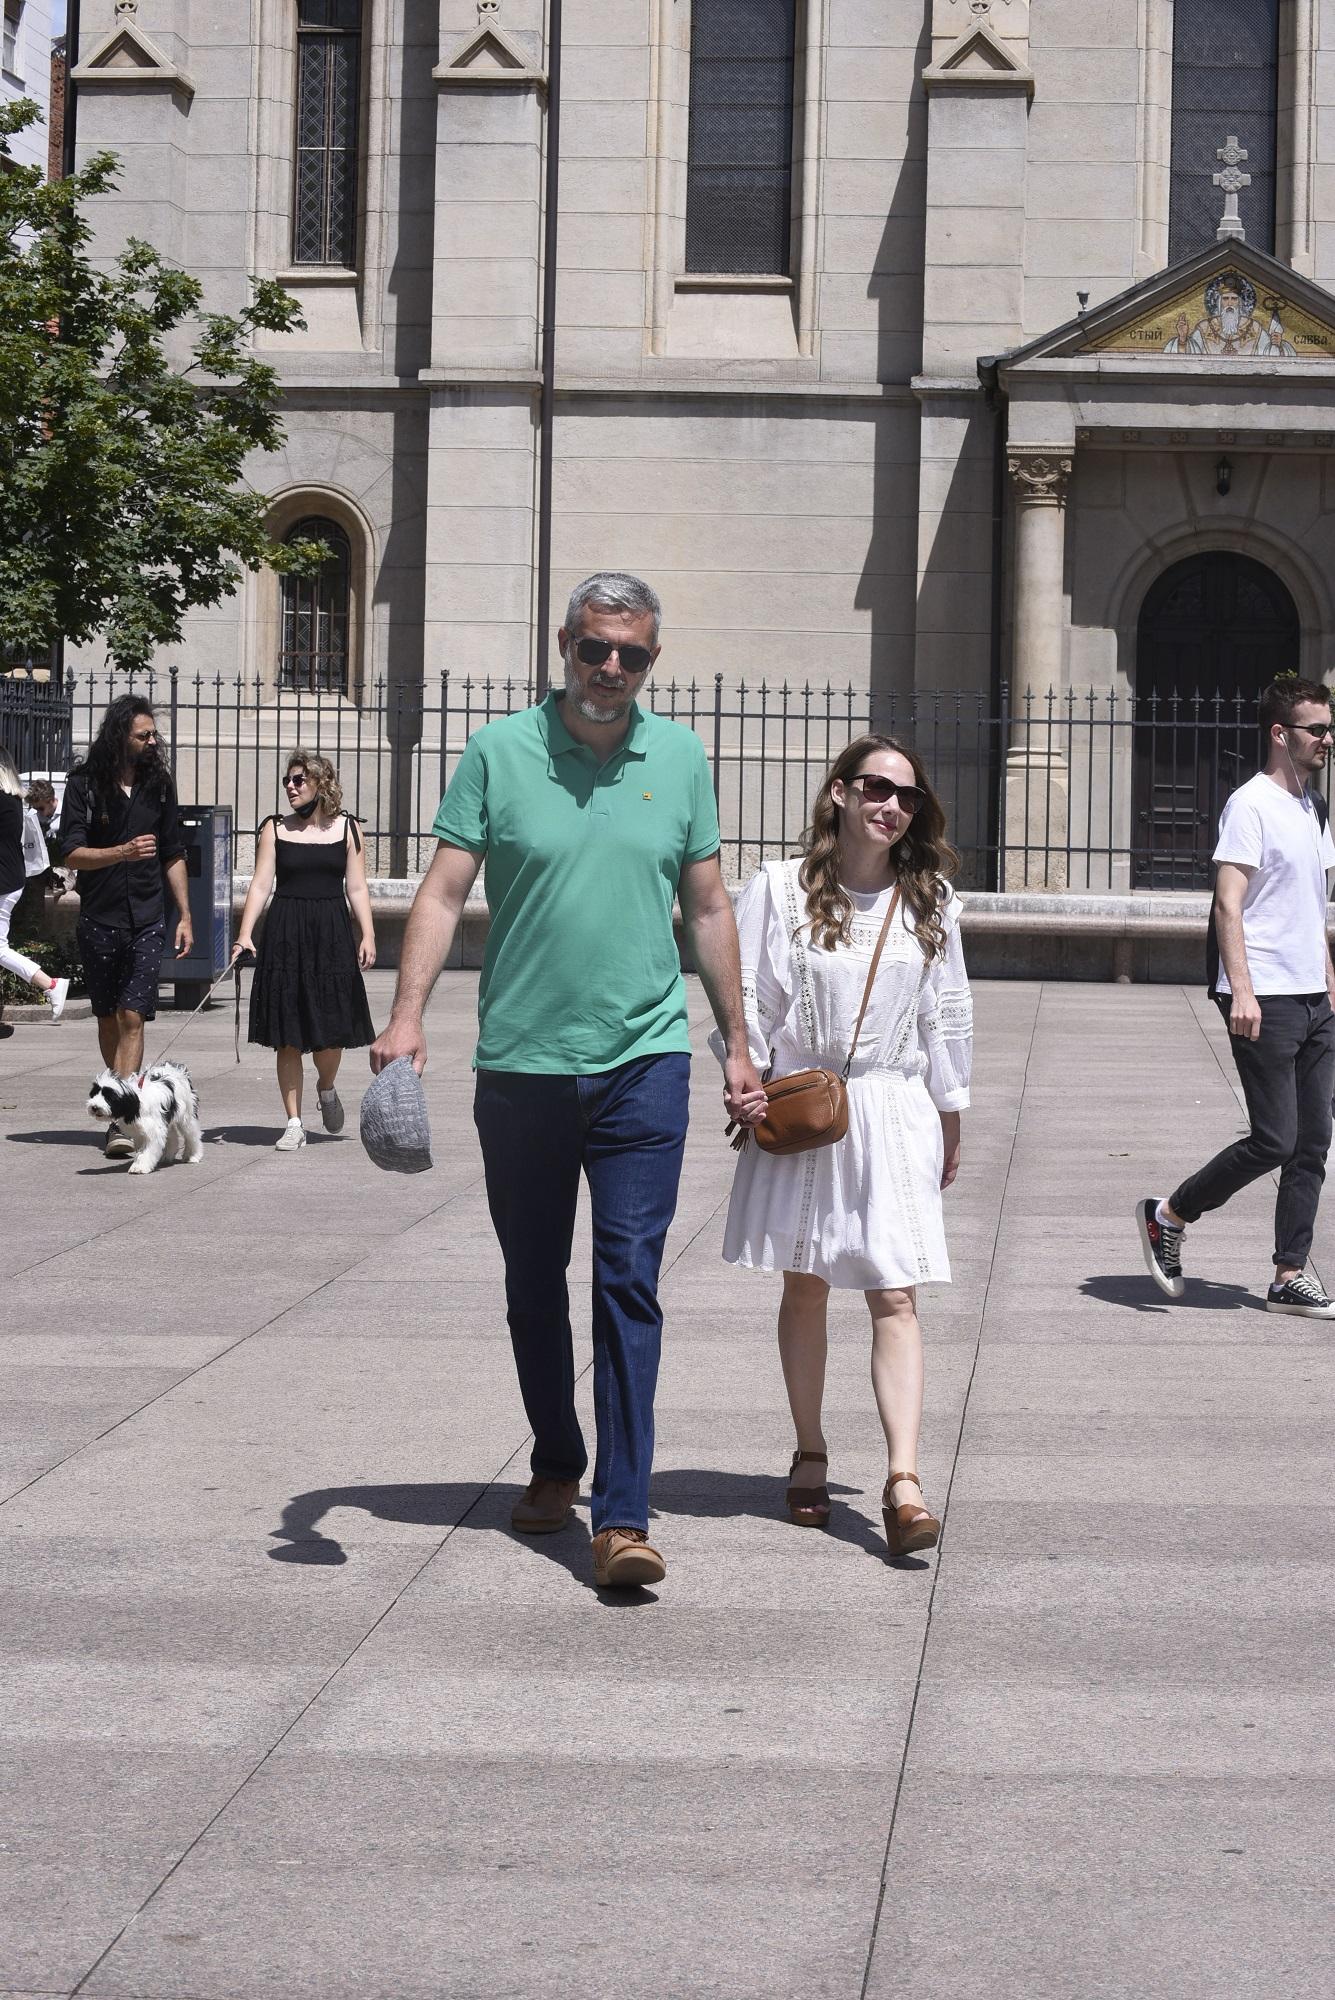 Spica / Zagreb 04.07.2020. / foto: Davor Matota / Nino Raspudic i Marija Selak Raspudic